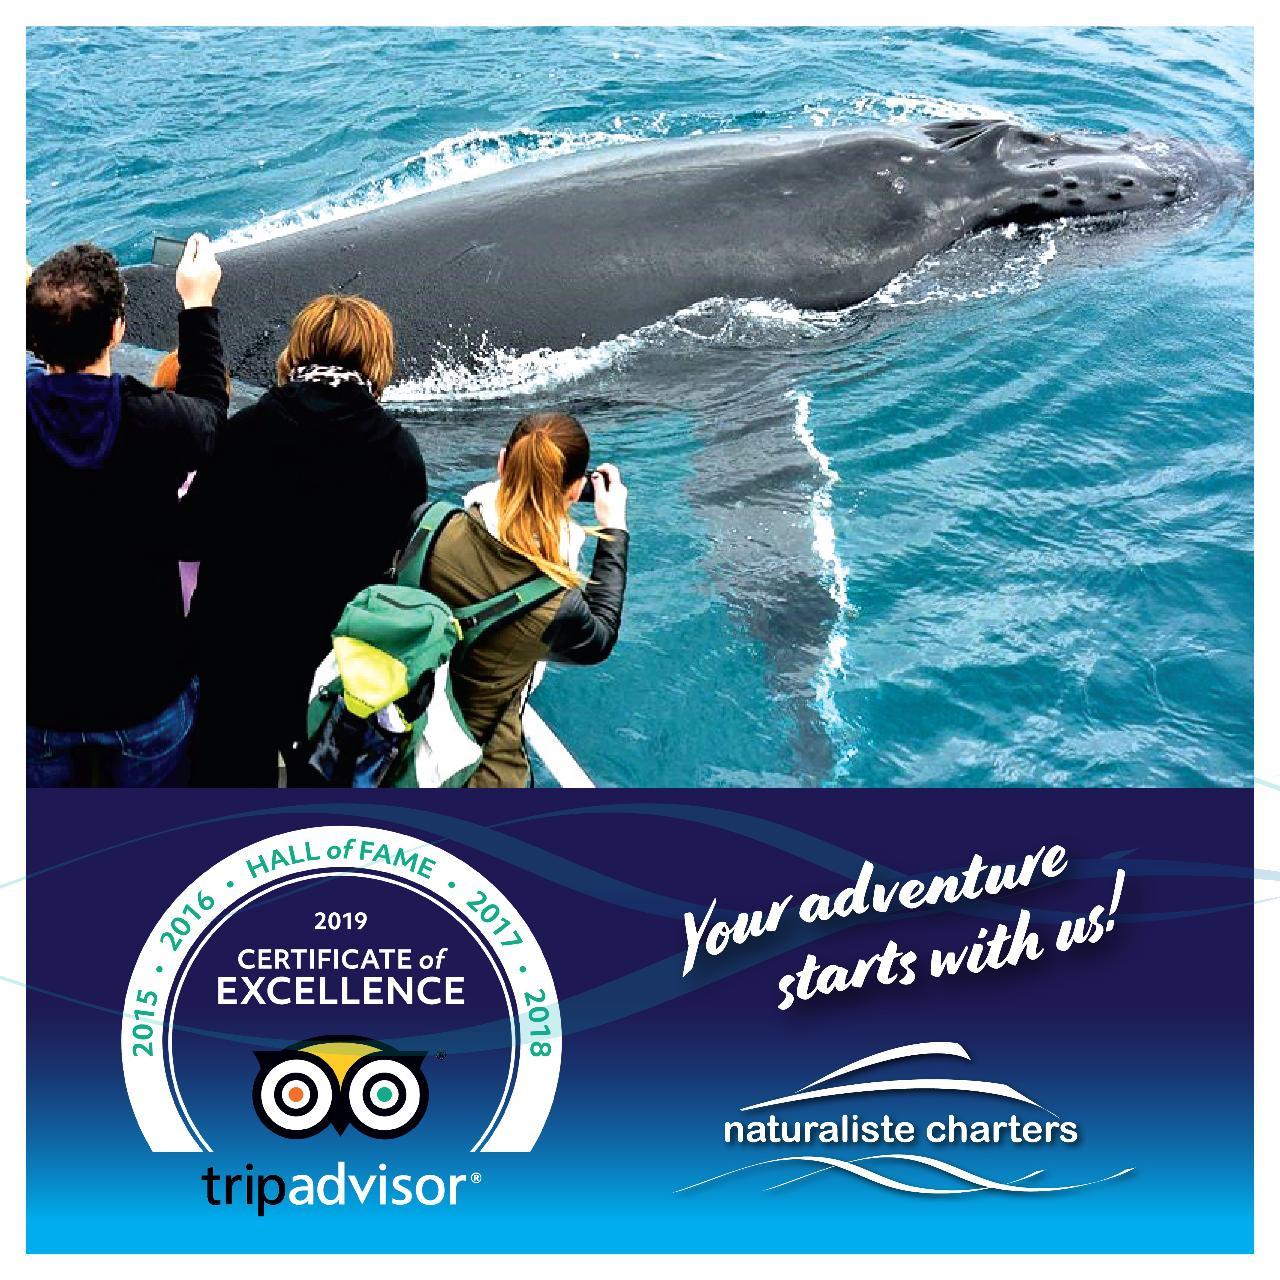 Dunsborough Whale Watching Eco Tours